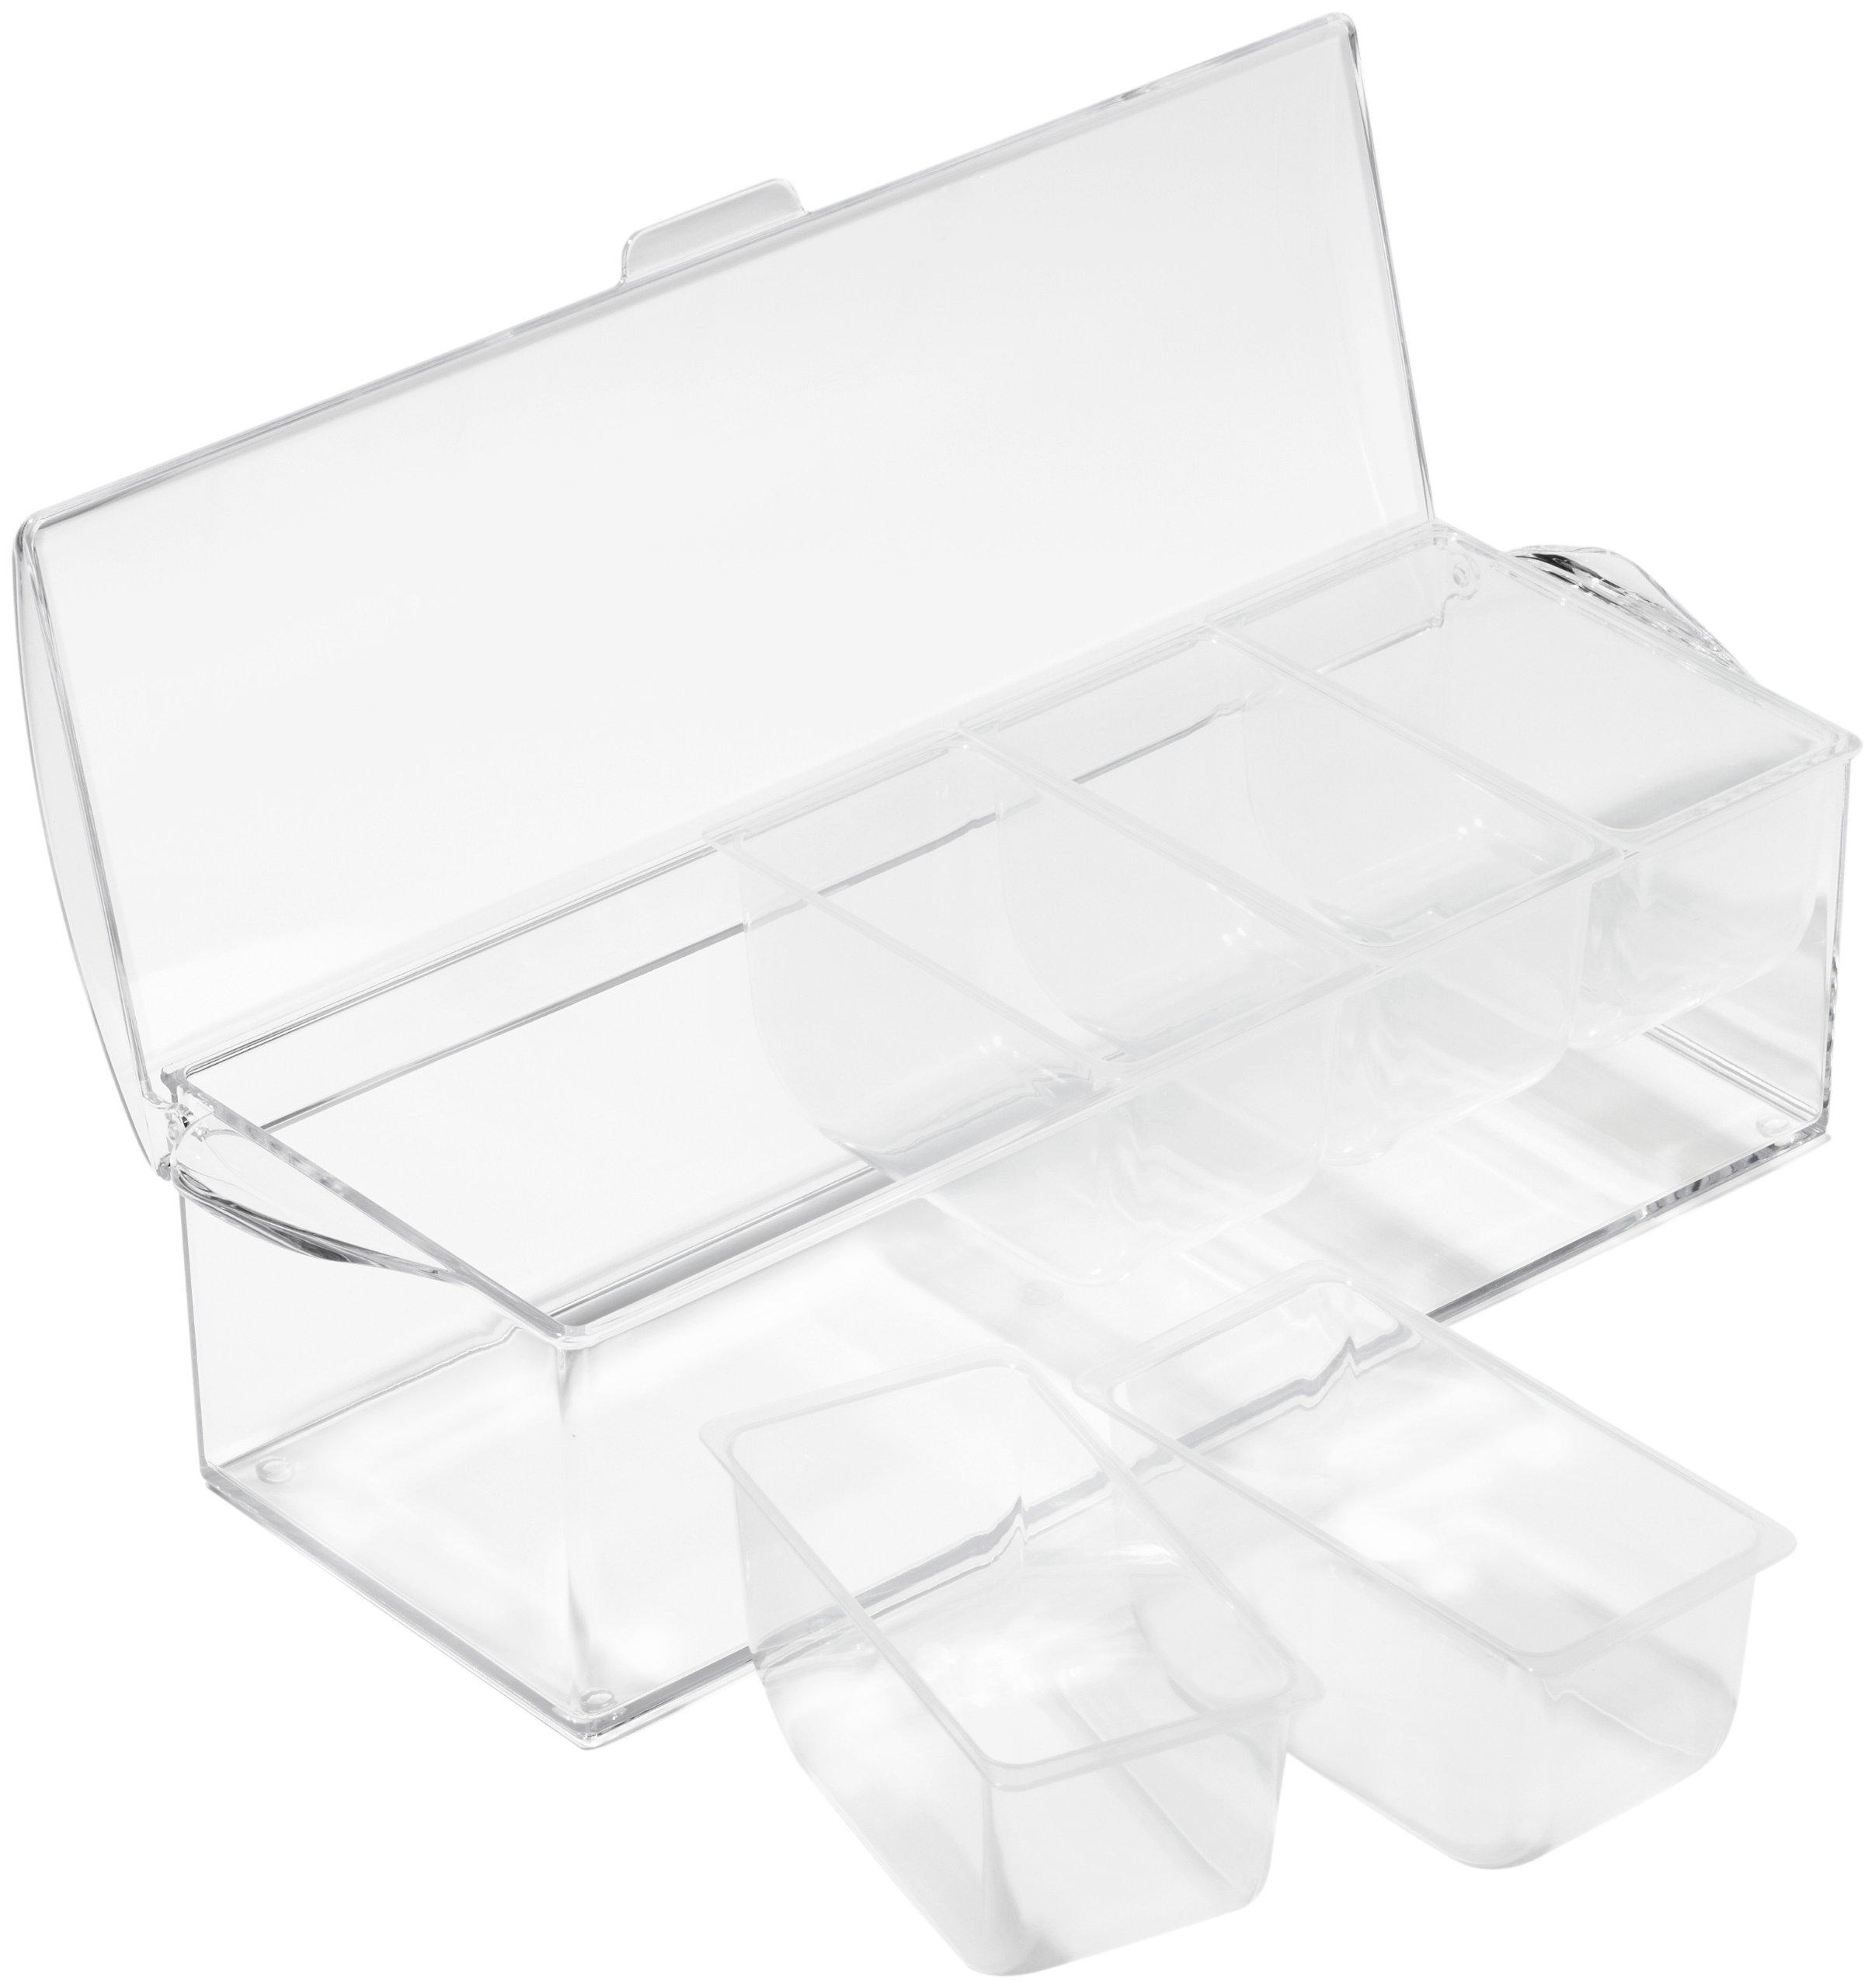 Prodyne AB-6 On-Ice Condiment, Clear